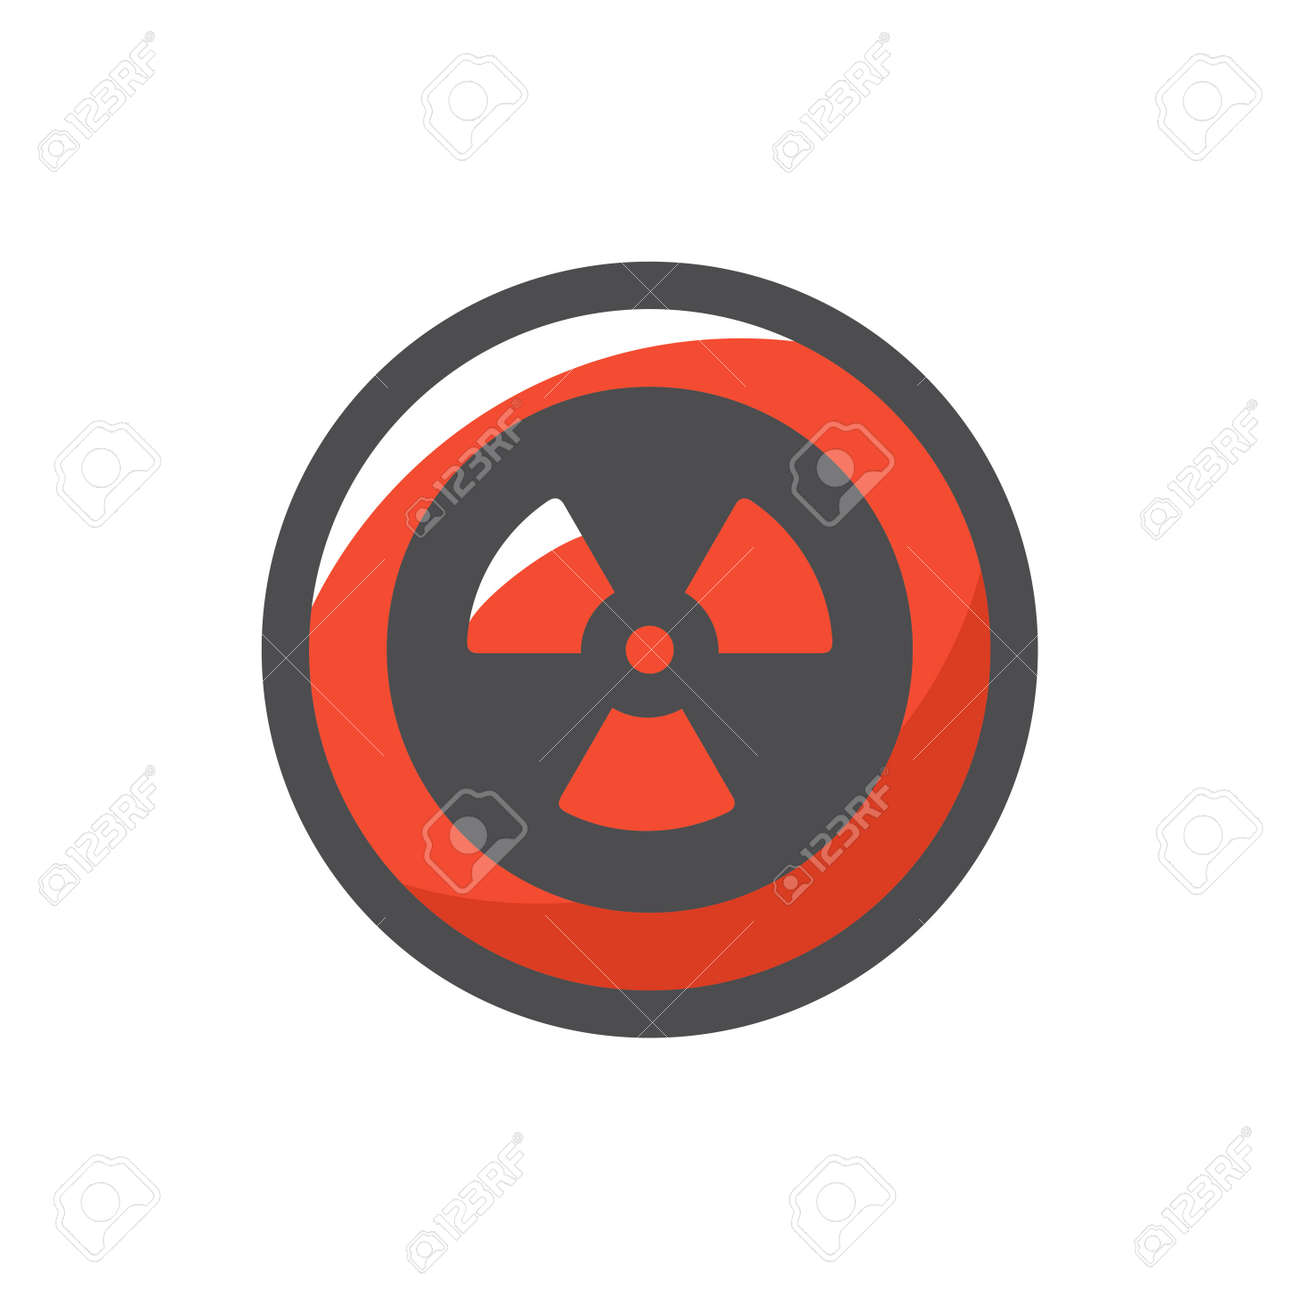 Radiation round Sign Vector icon Cartoon illustration. - 169912782